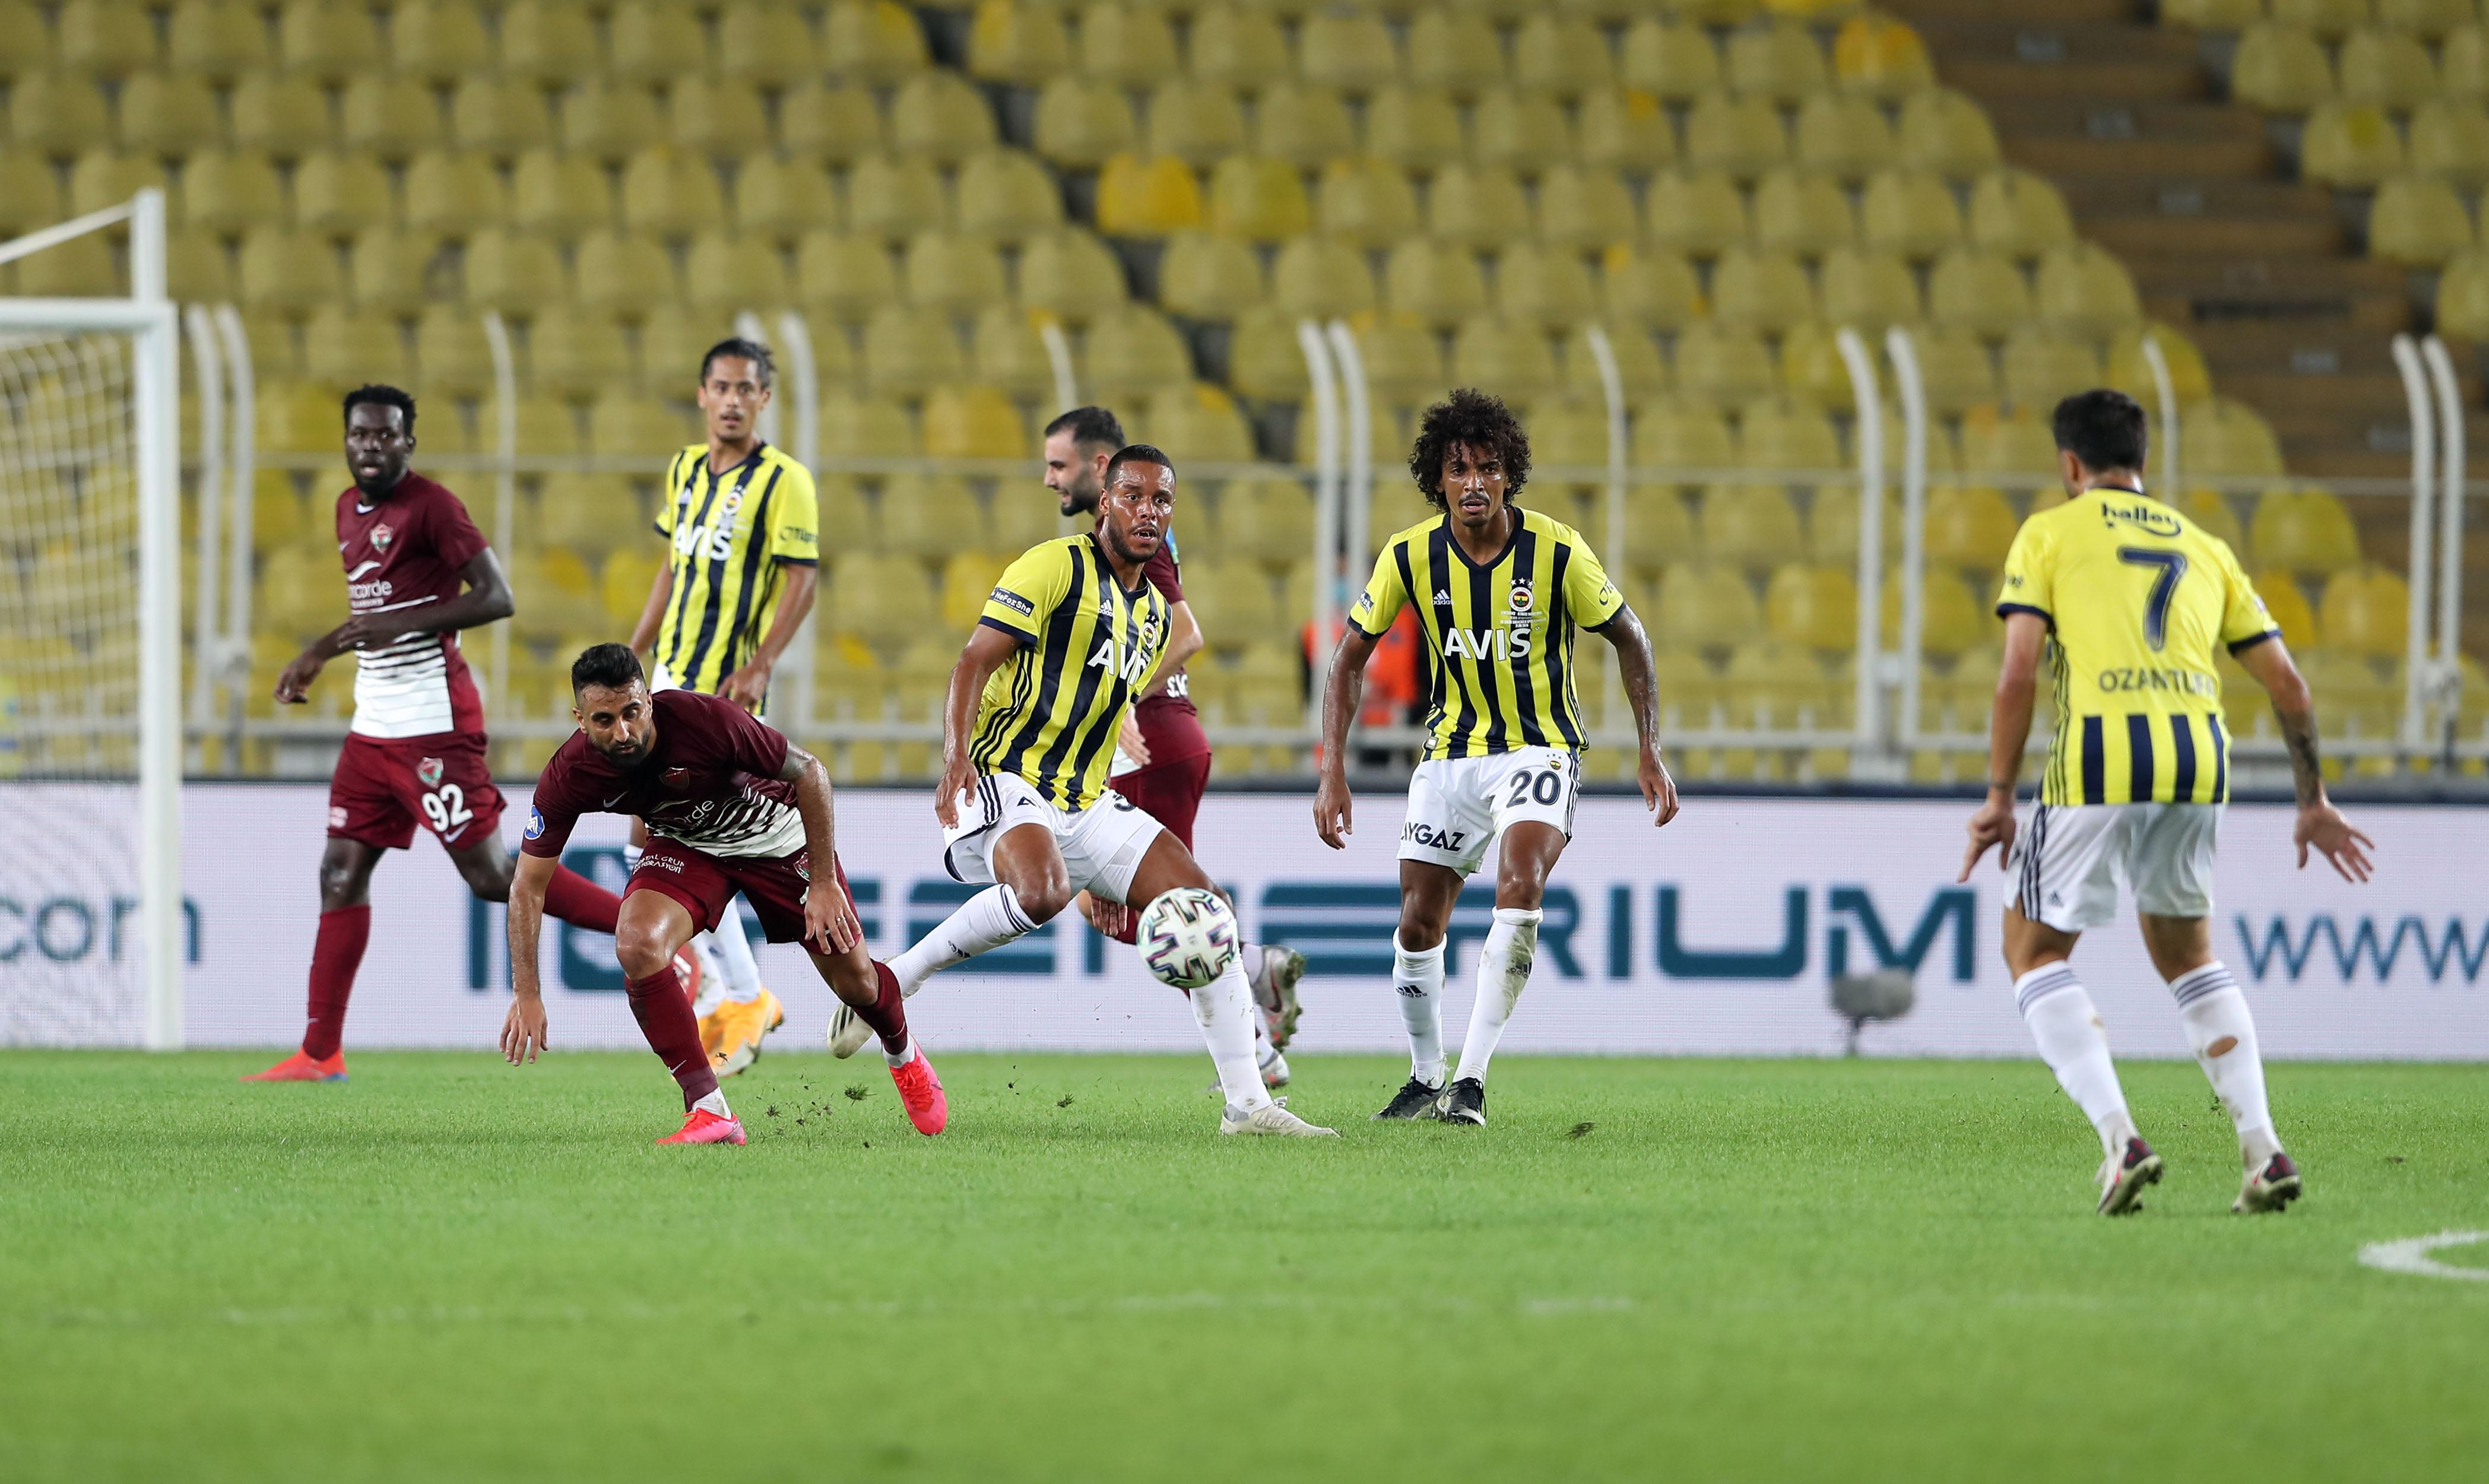 Fenerbahçe 0-0 Atakaş Hatayspor